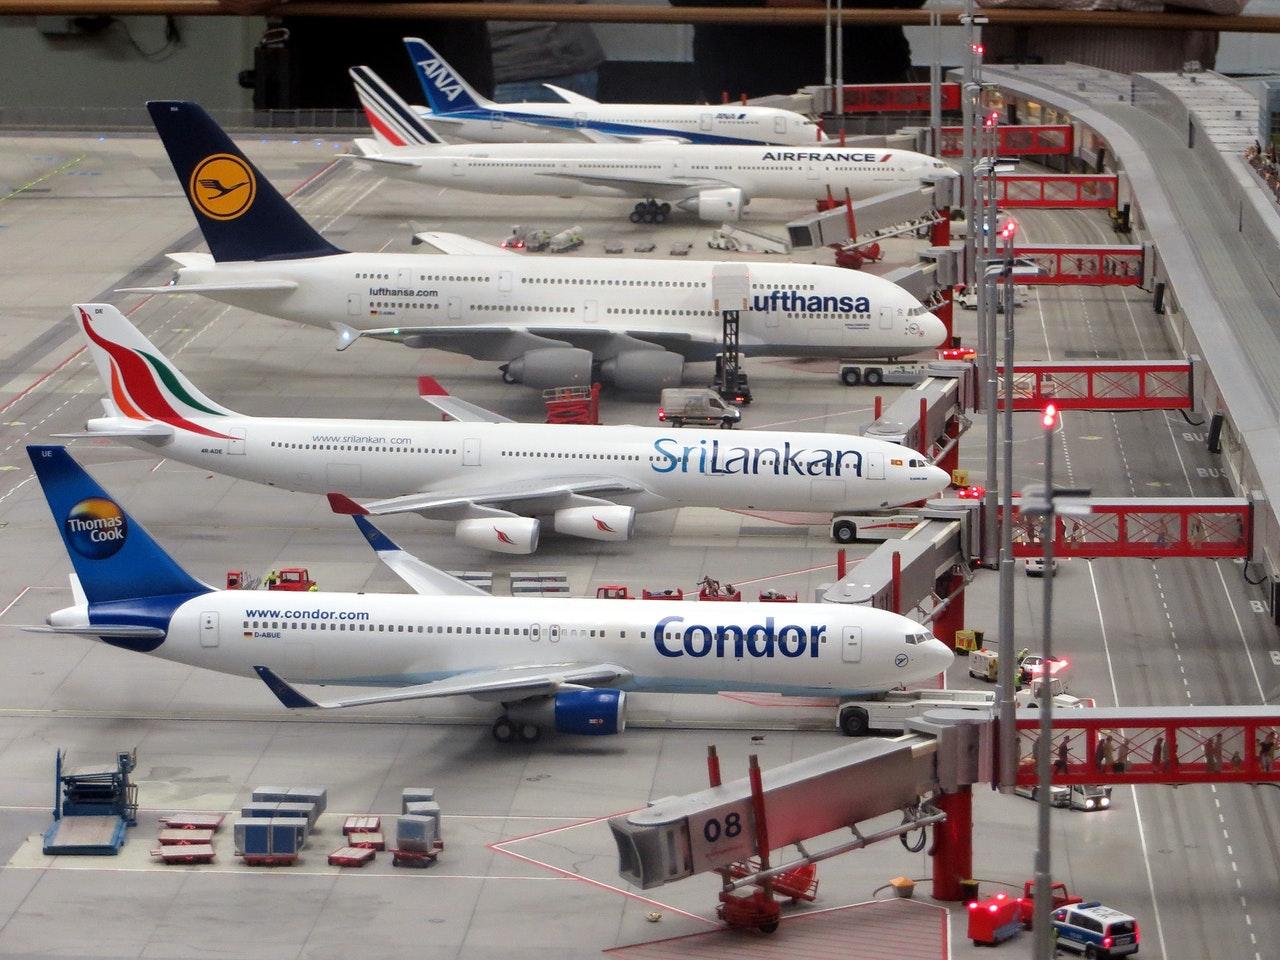 Blog: We should all feel 'flying shame' when we step onto a plane